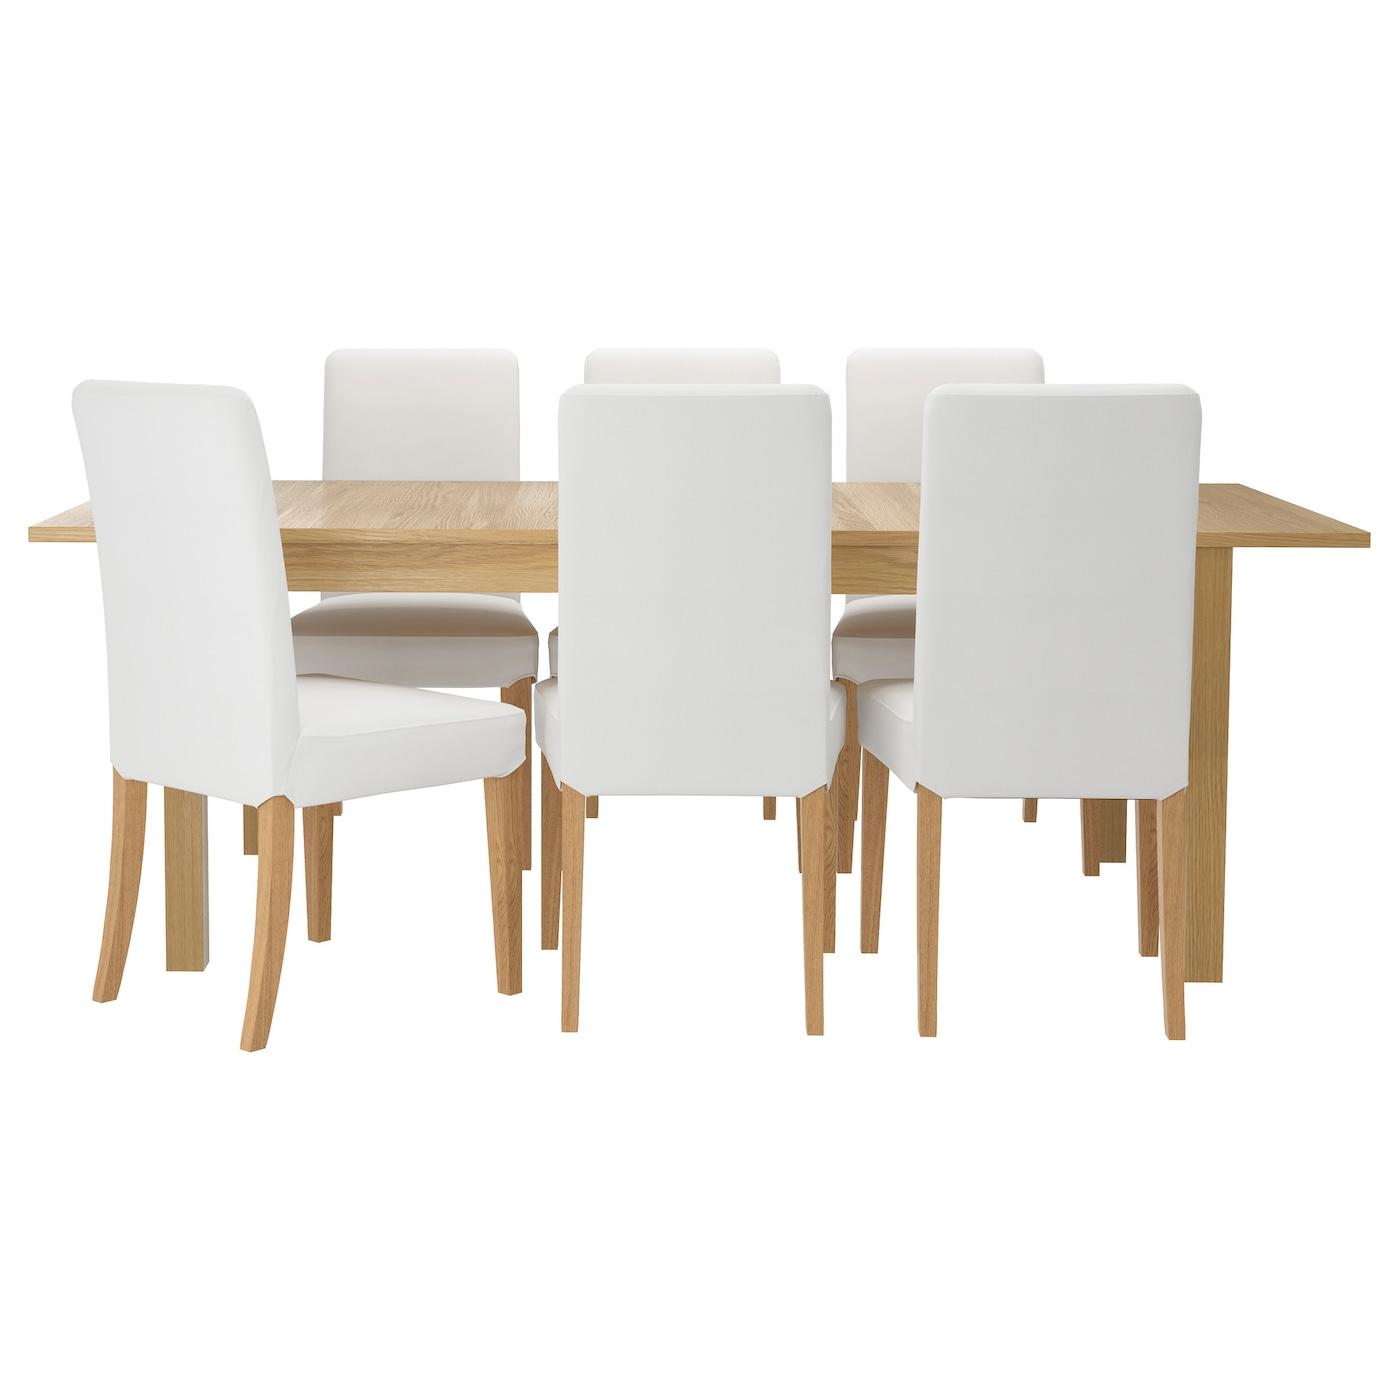 Henriksdal bjursta table and 6 chairs oak veneer gr sbo white 175 cm ikea - Ikea oak dining chairs ...